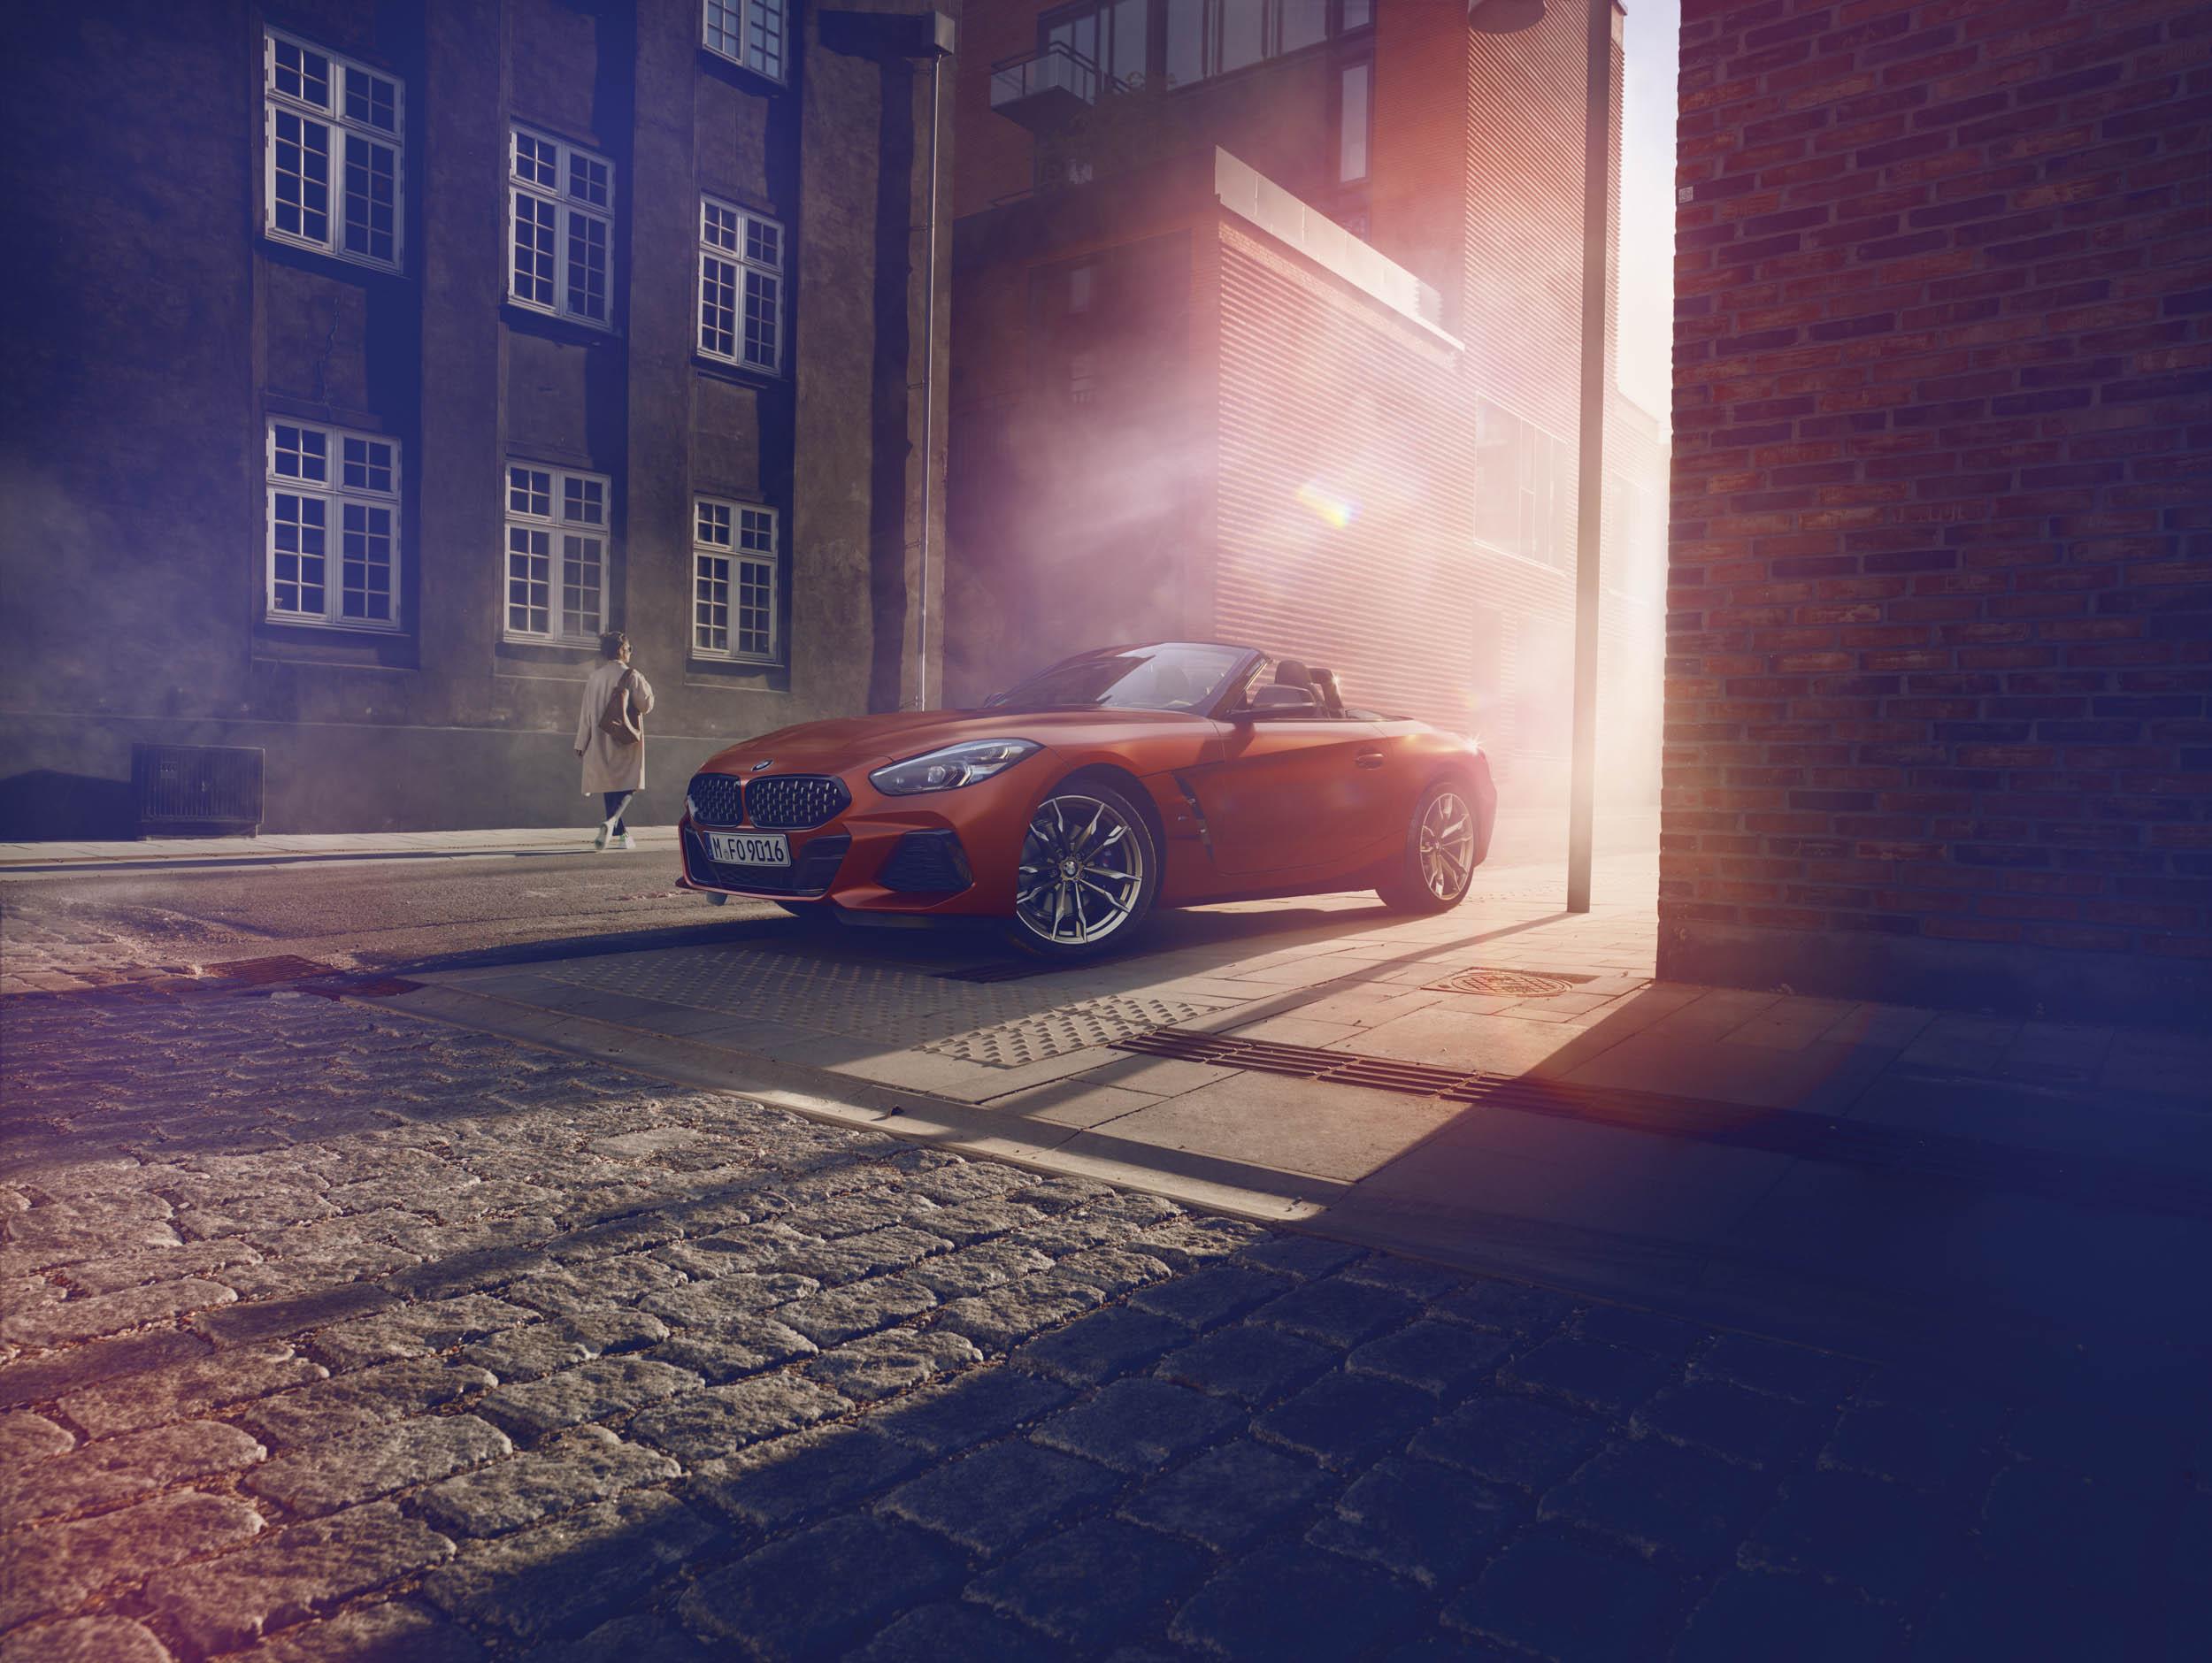 BMW Z4 M40i low front 3/4